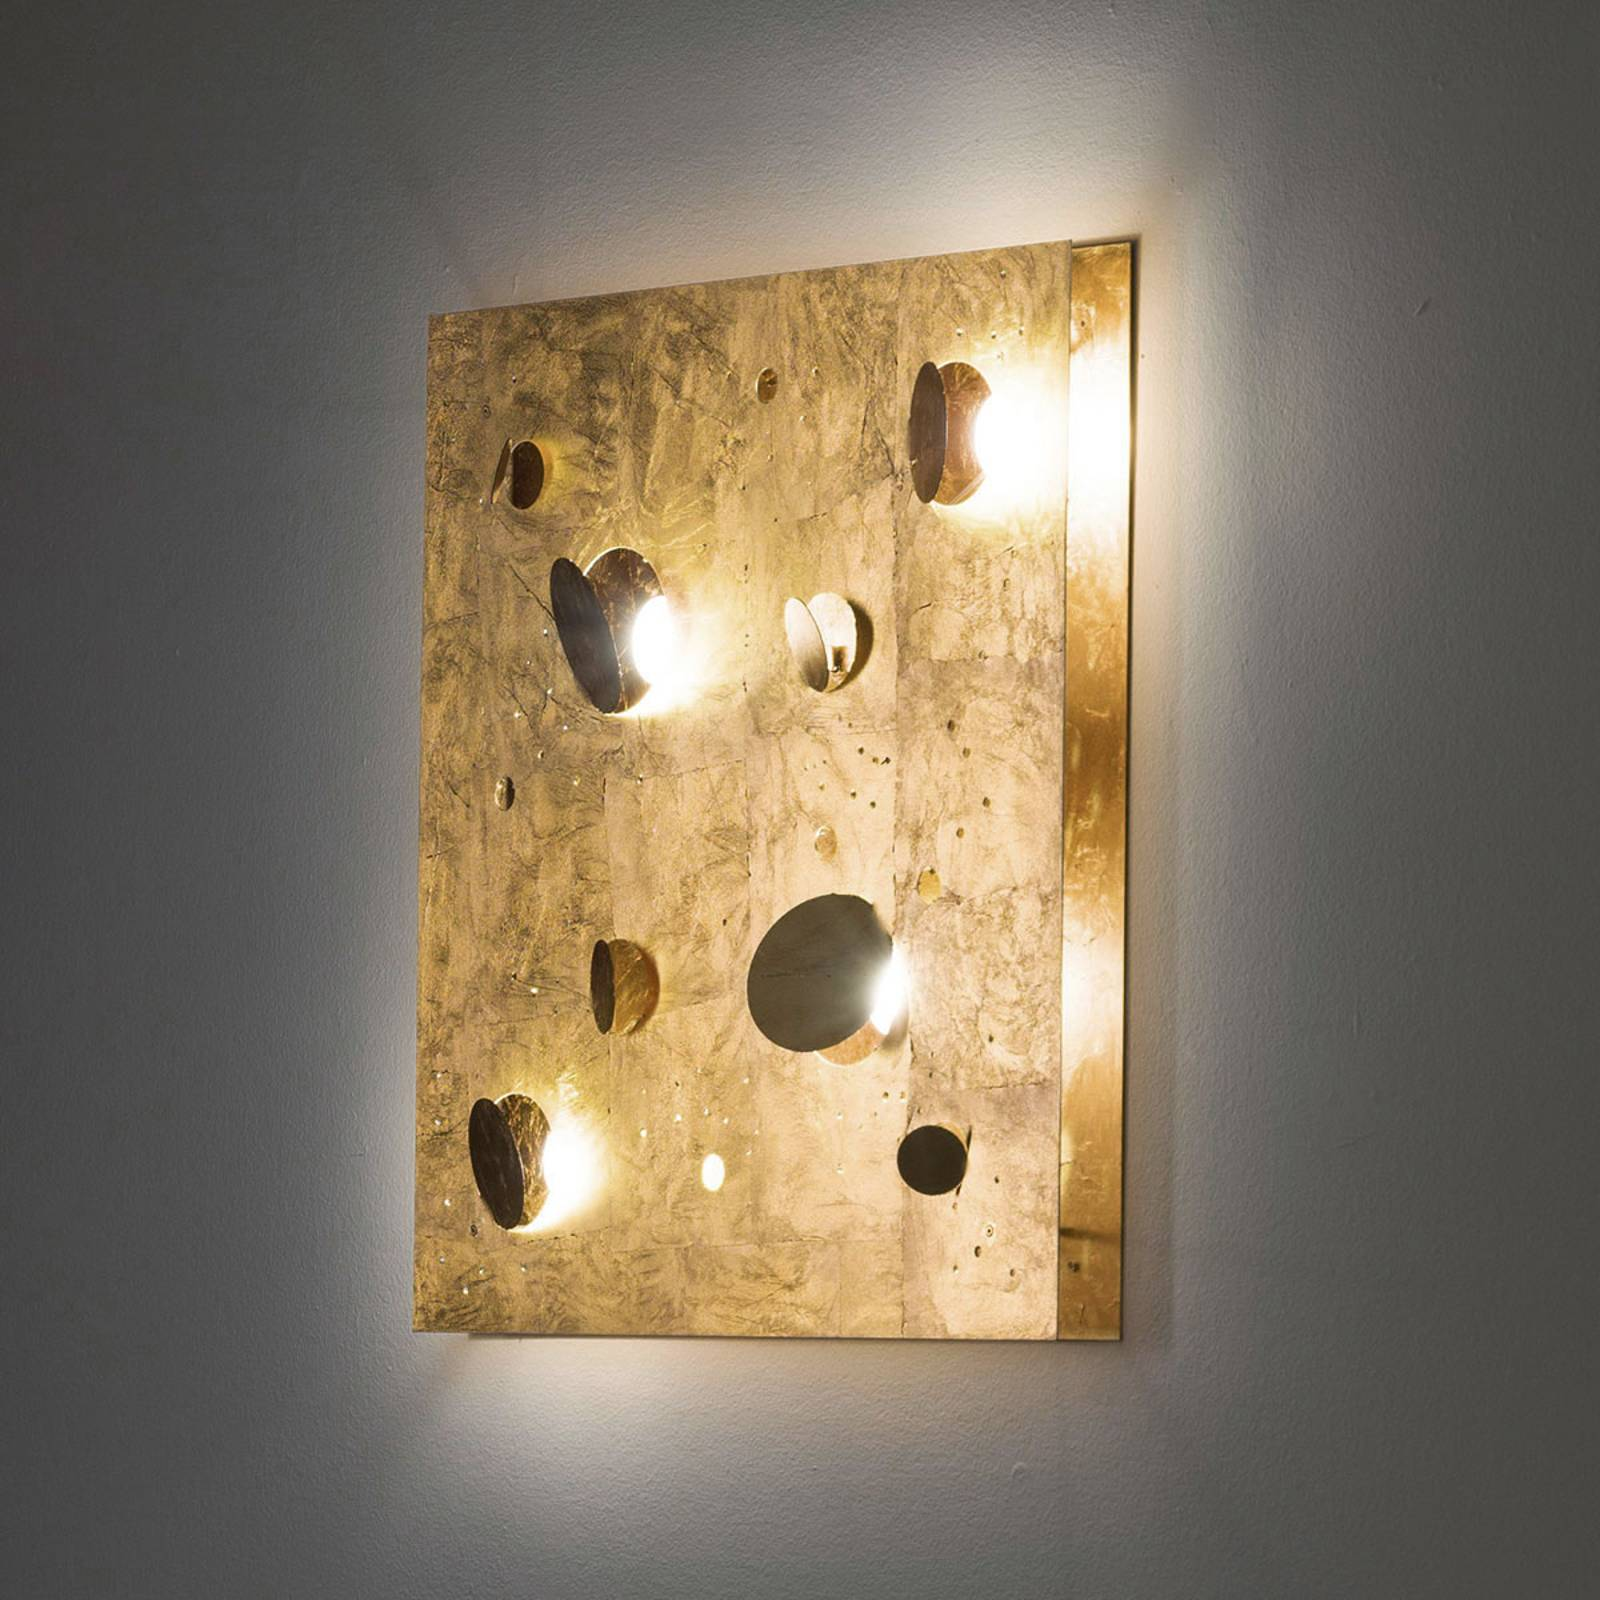 Knikerboker Buchi wandlamp 60x60cm bladgoud